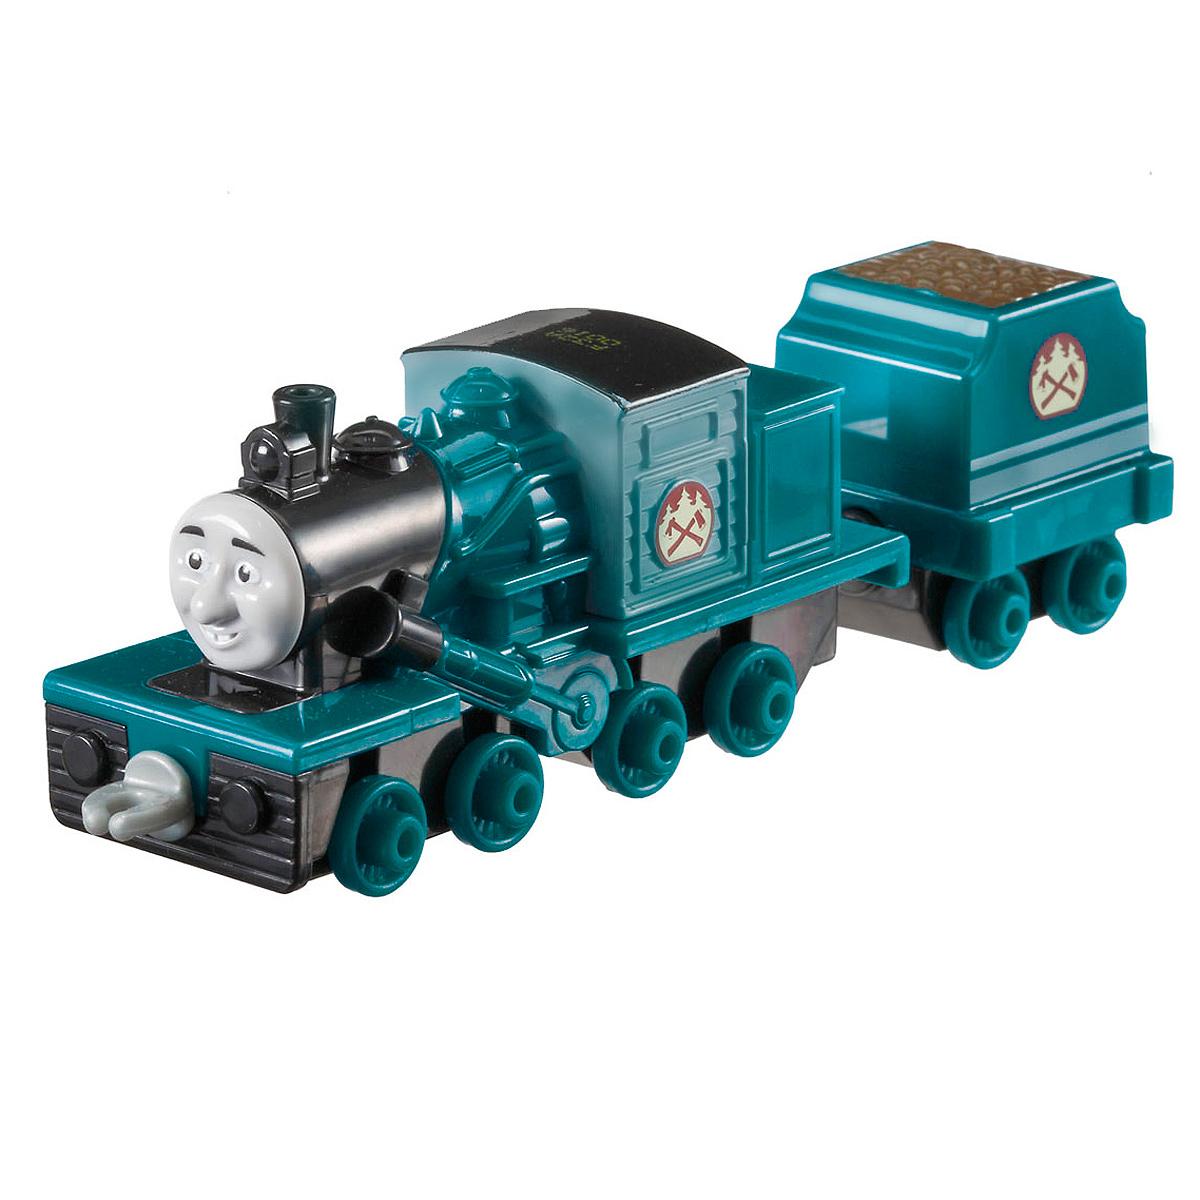 Thomas&Friends Collectors